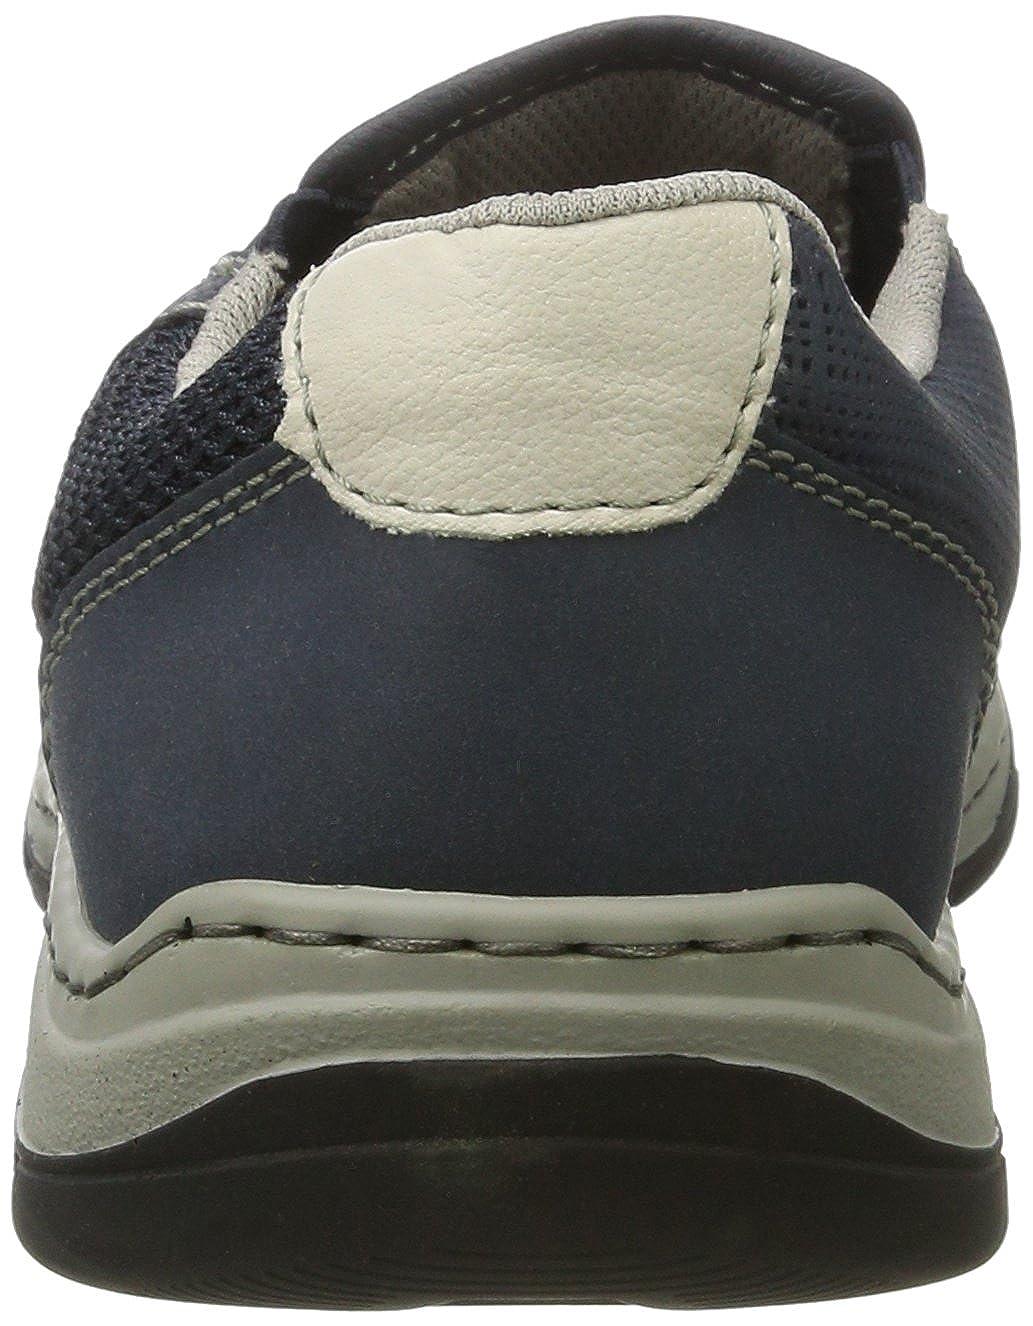 Mens 15253 Loafers, Grey, 6.5 UK Rieker